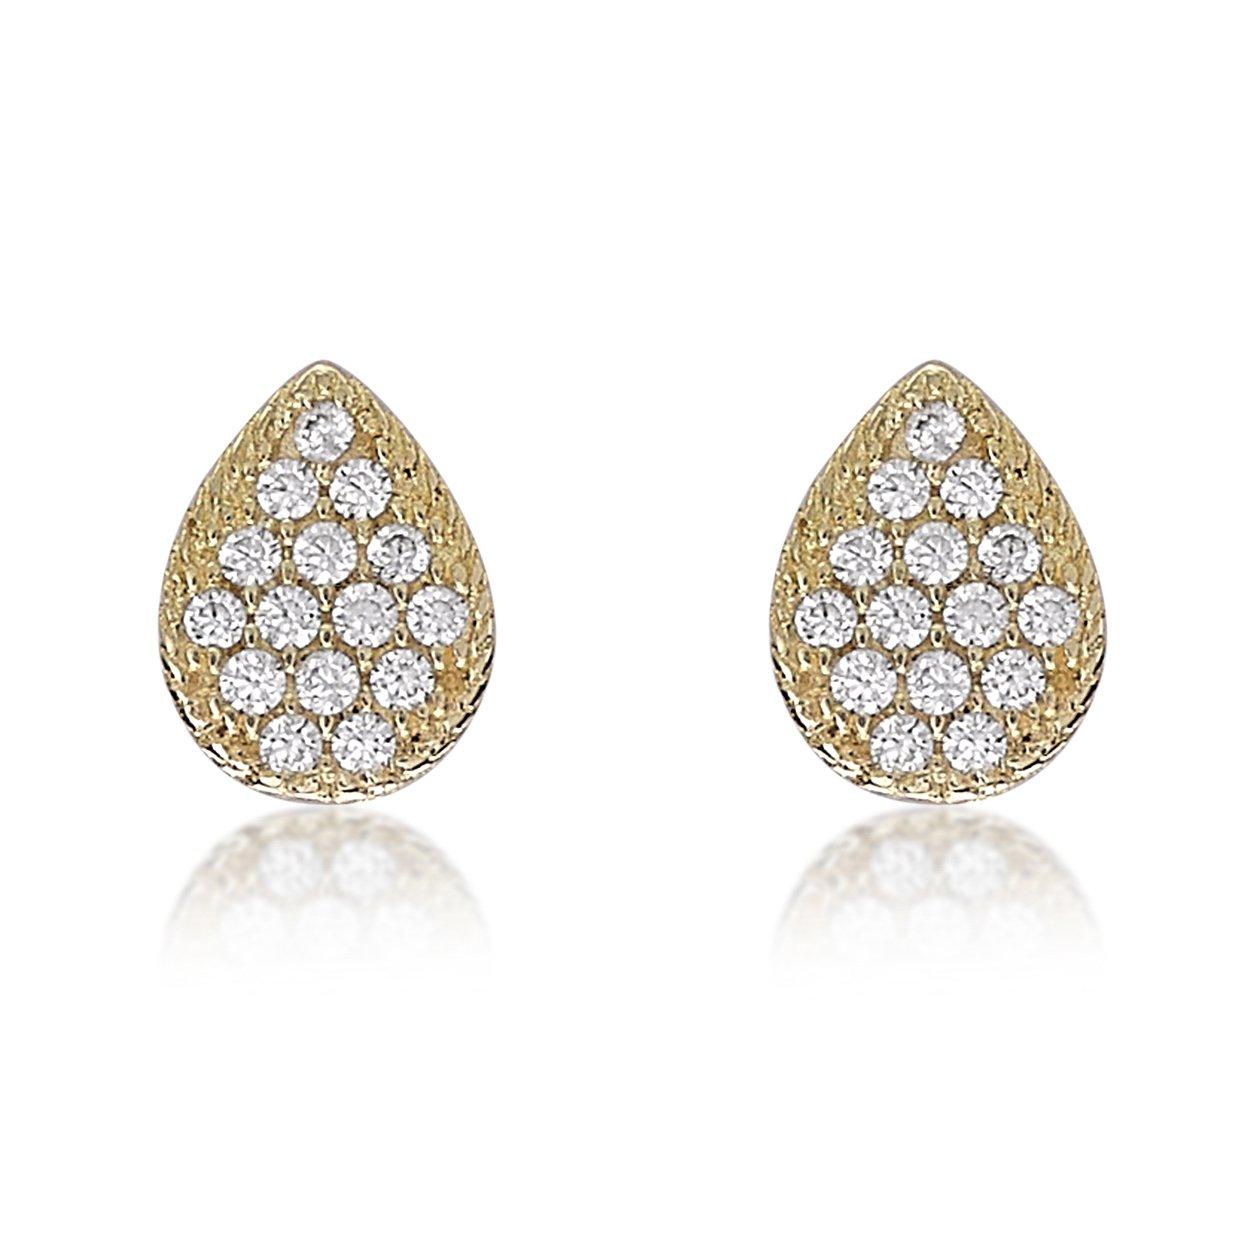 170b83b7a Carissima Gold Women's 9 ct Yellow Gold Cubic Zirconia 6 x 8 mm Pear Shaped Stud  Earrings: Amazon.co.uk: Jewellery